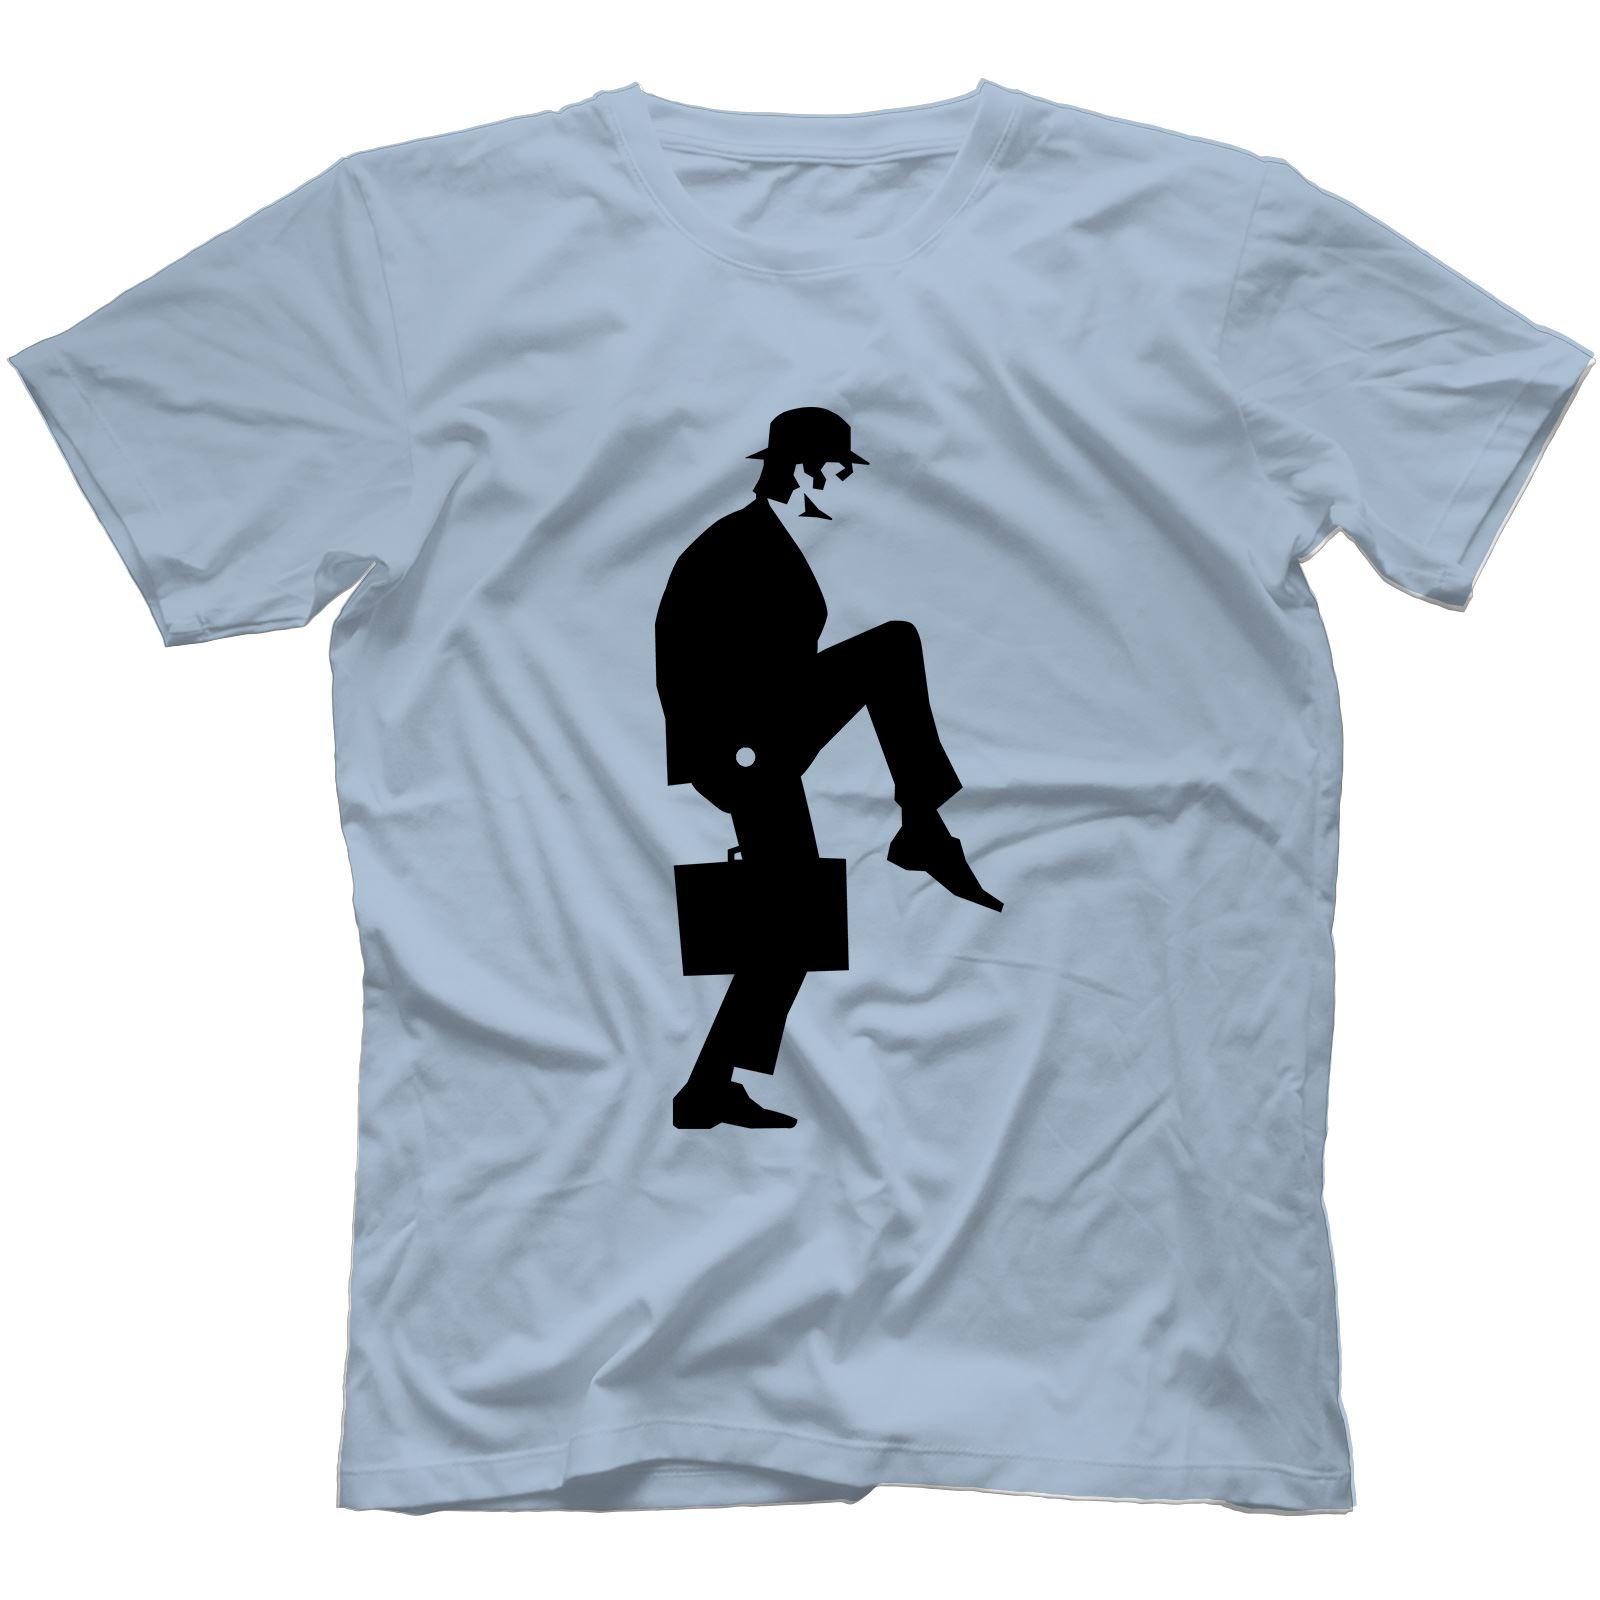 423ae956 Ministry Of Silly Walks T-Shirt 100% Cotton Monty Python Inspired | eBay